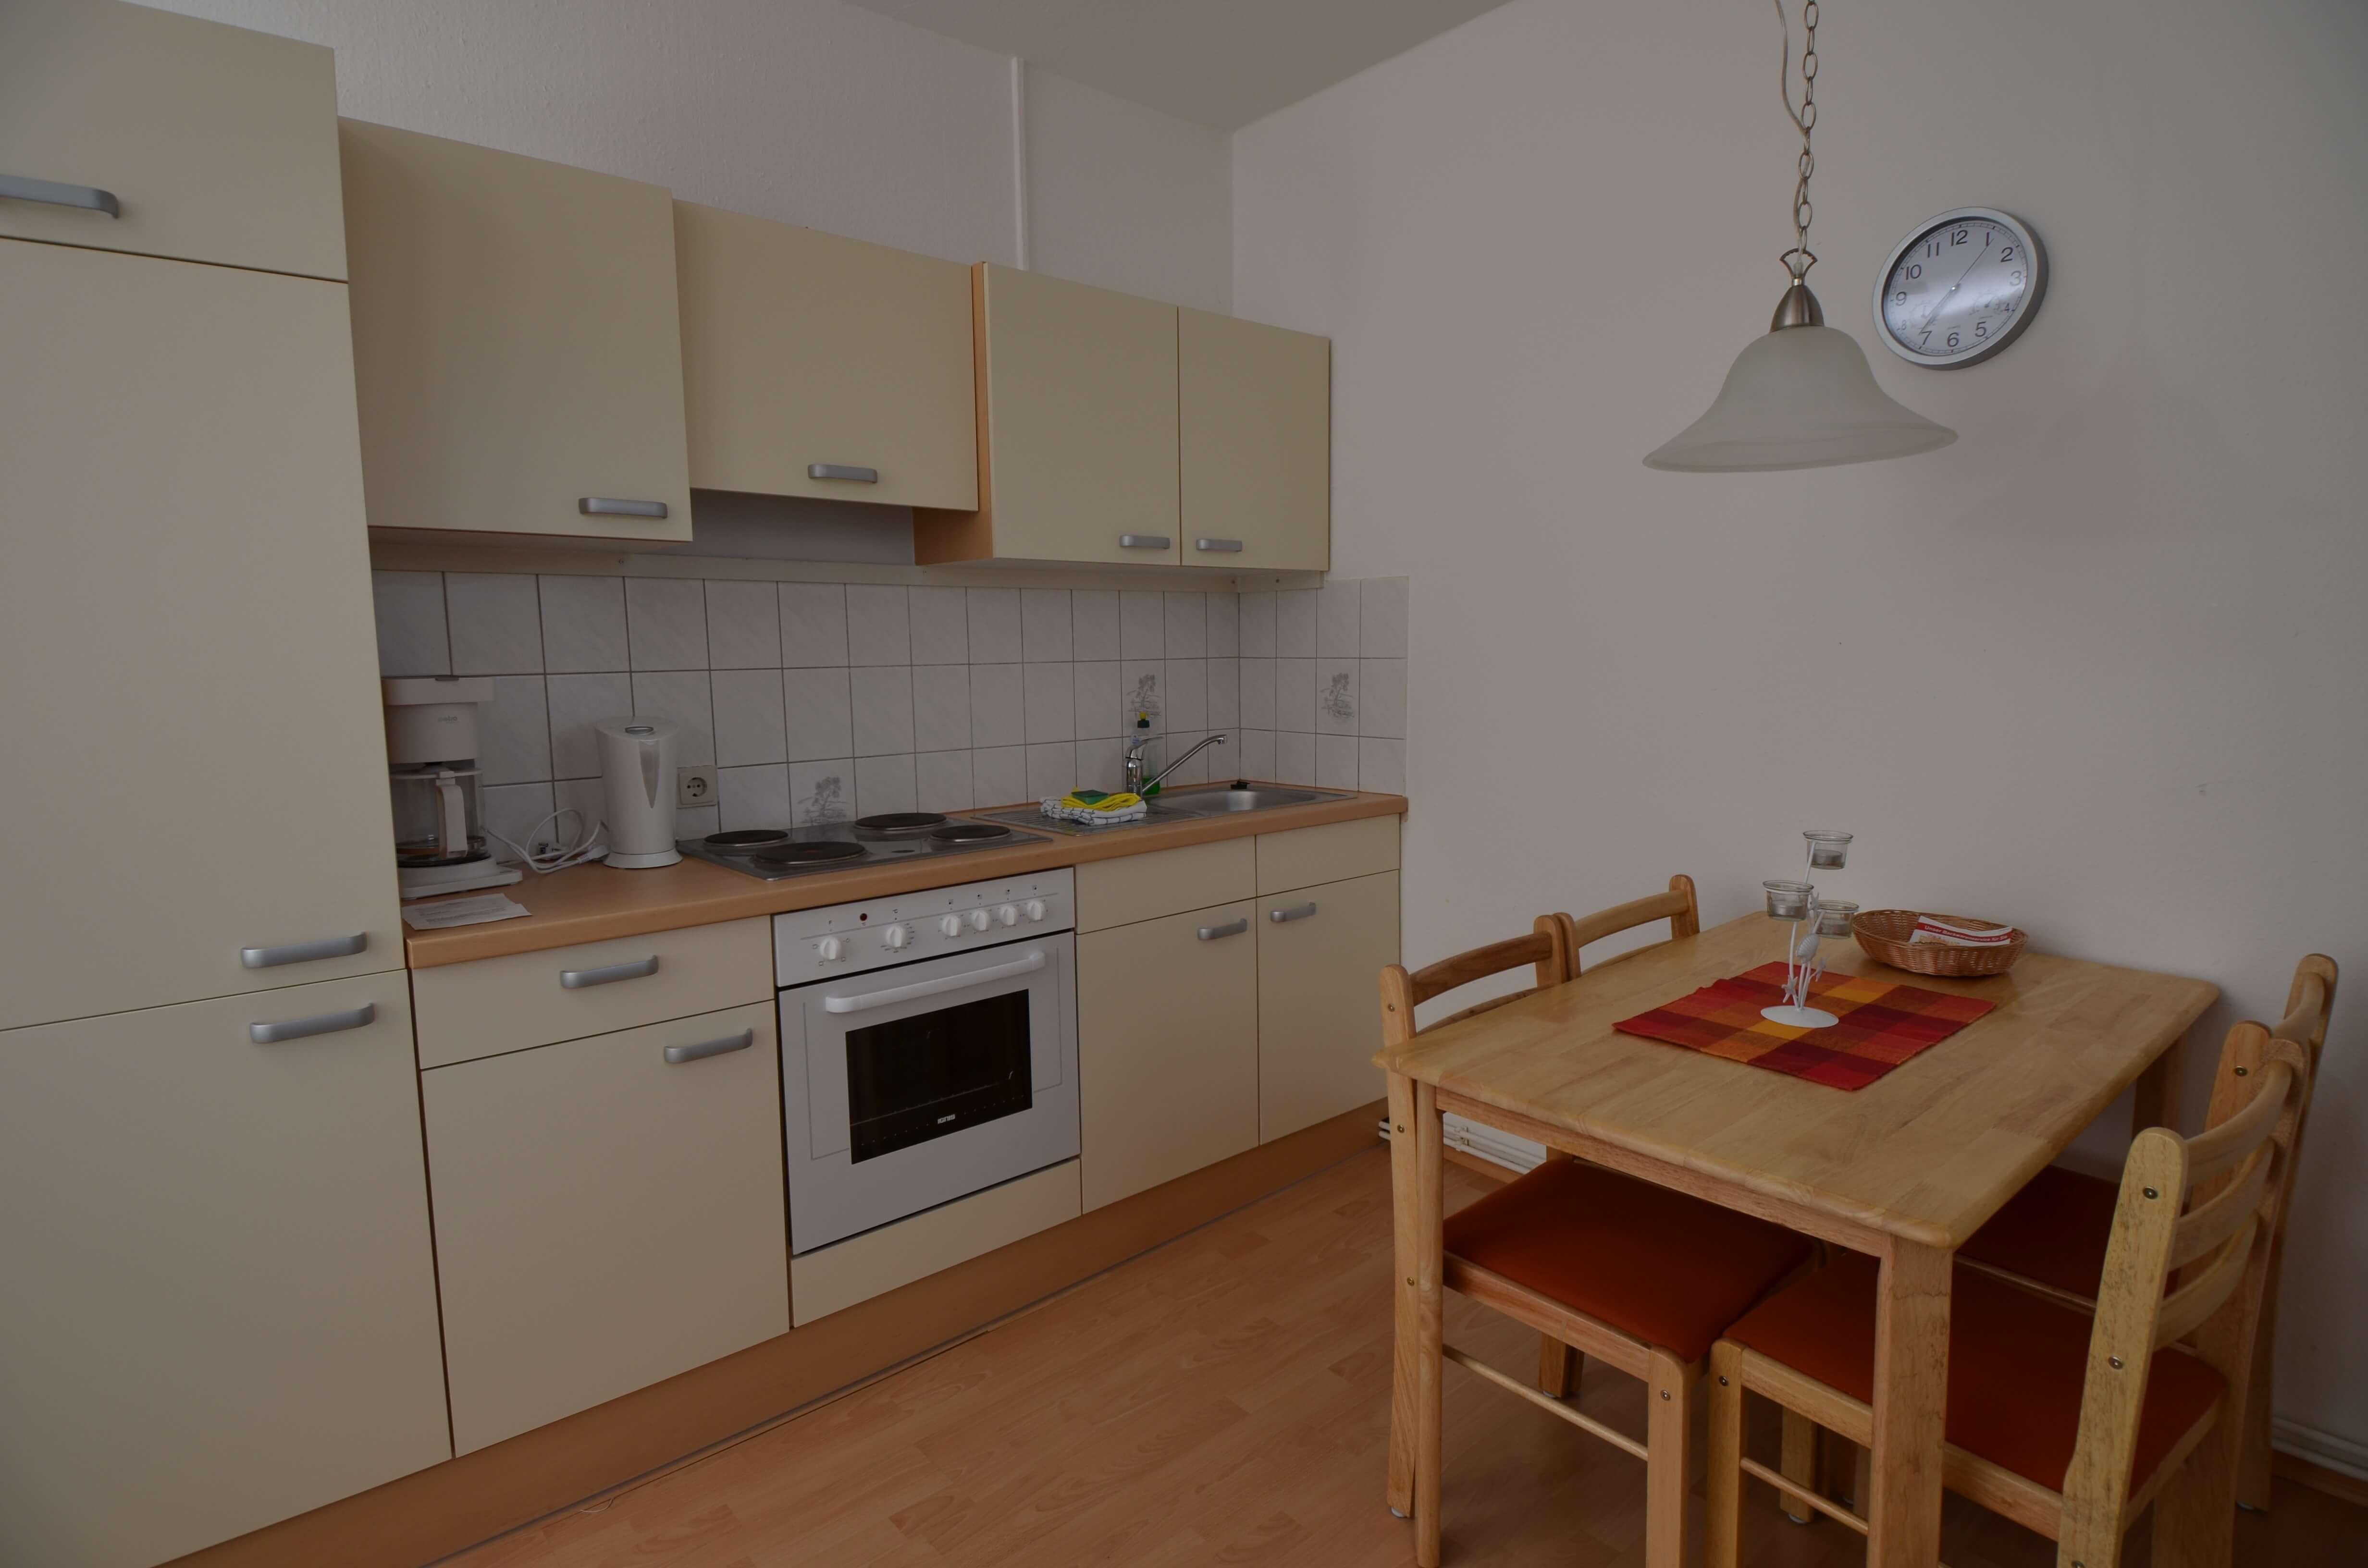 Apartment 11 4 personen apartmenthaus schleiblick for Kochen 4 personen